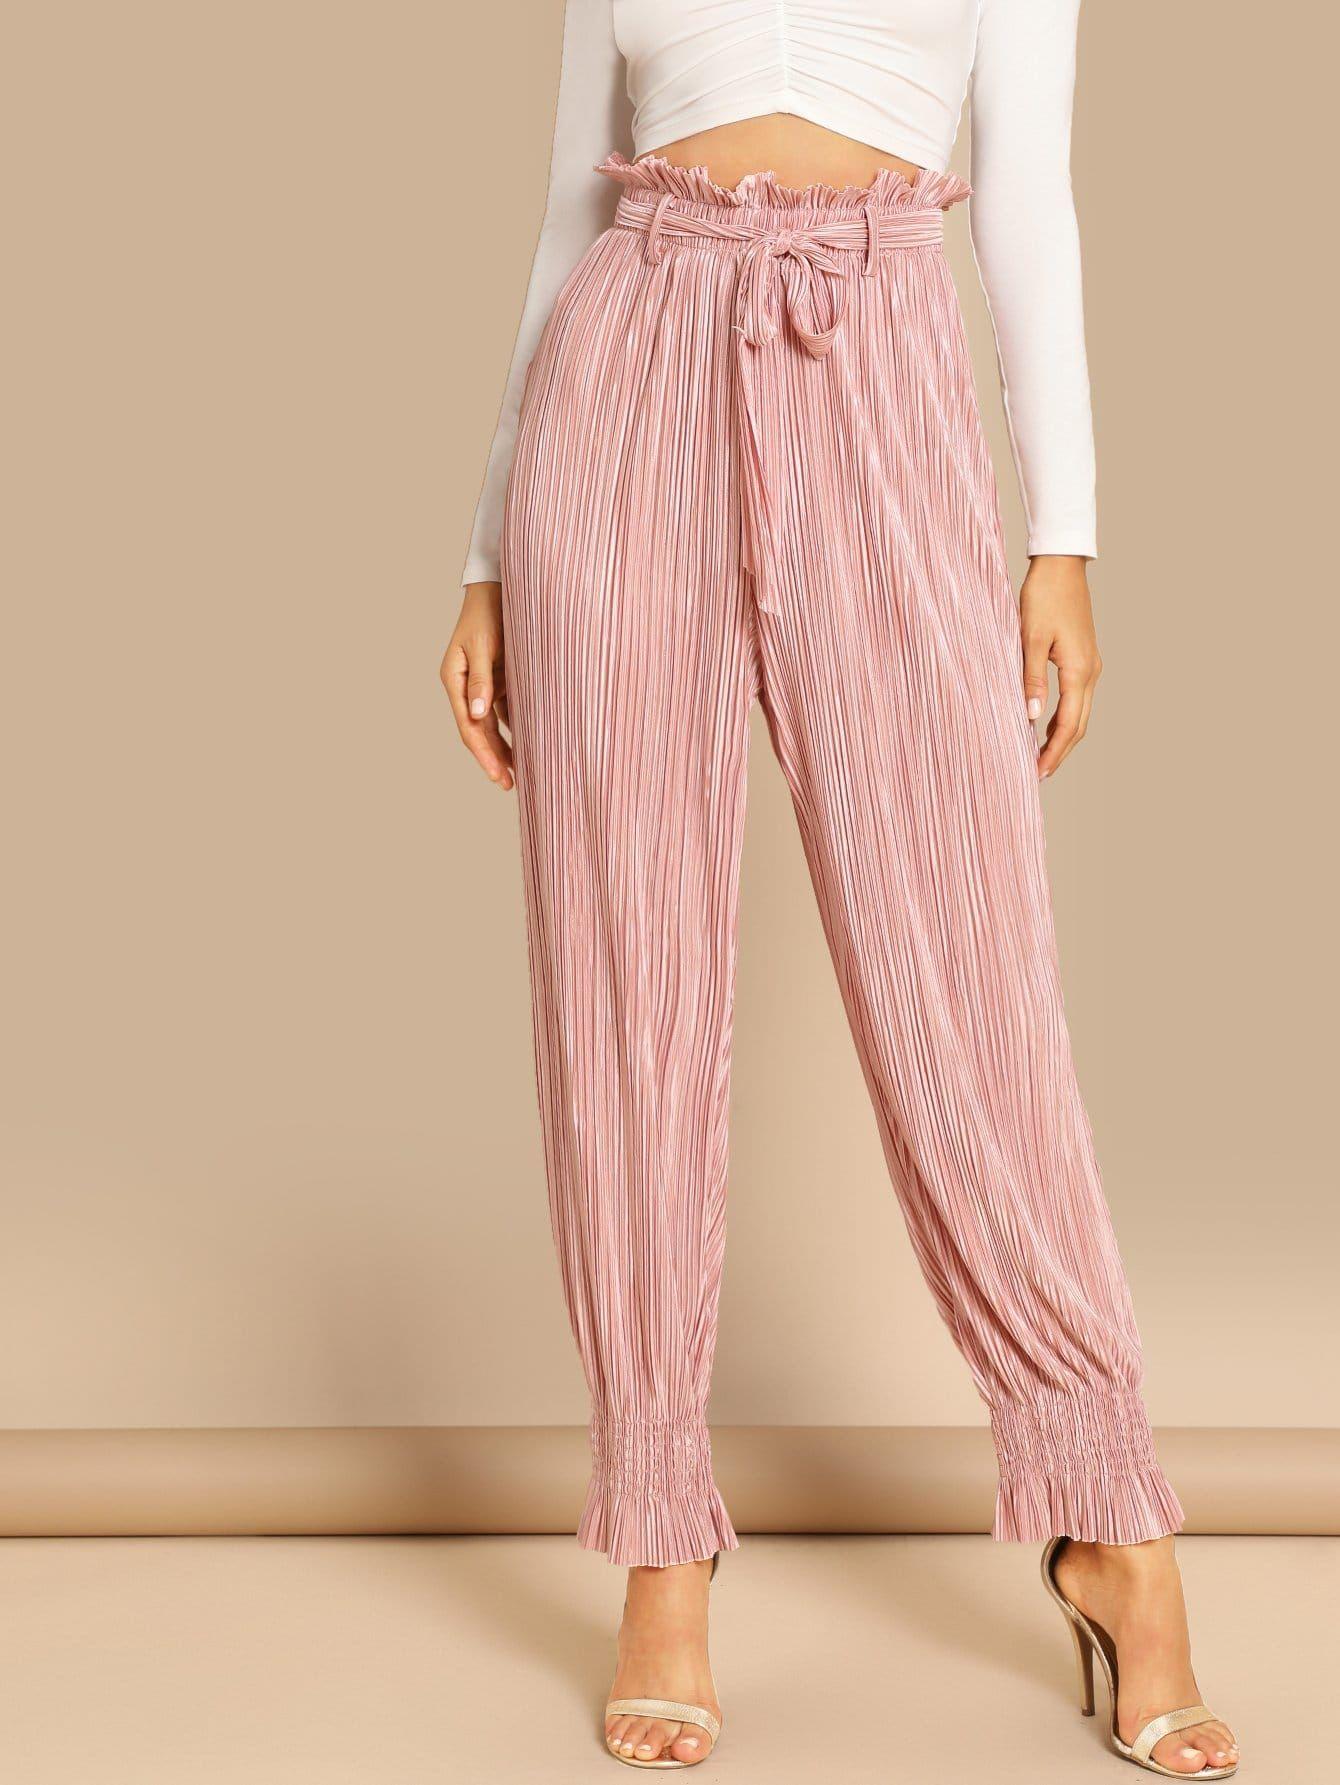 5d750a617680 Glamorous Plain Regular Elastic Waist High Waist Pink Long Length Tie Neck  Frill Trim Pleated Pants with Belt